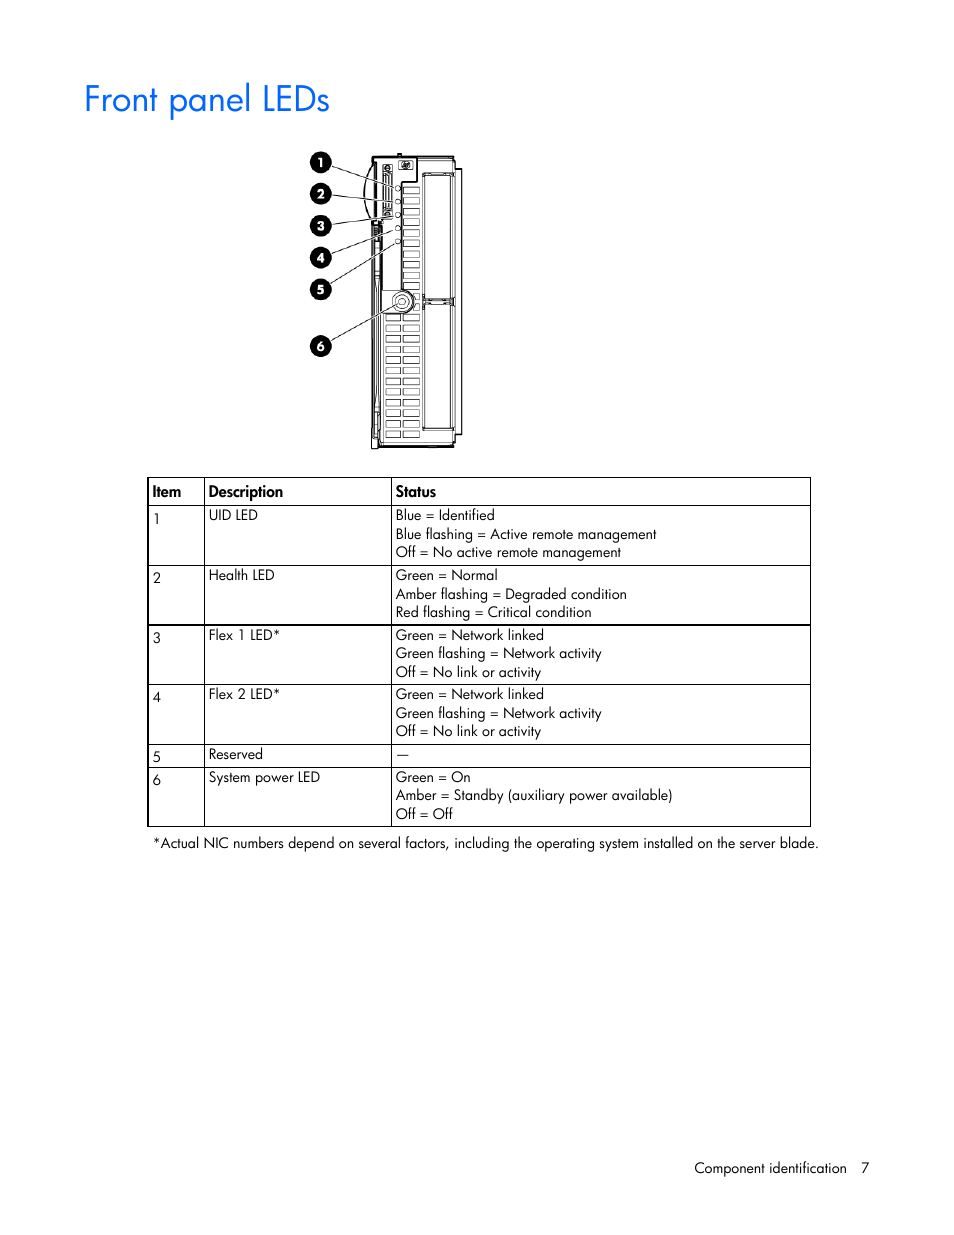 bl460c maintenance and service guide basic instruction manual u2022 rh ryanshtuff co hp proliant bl460c g1 service manual BL460c G1 Blade Chassis